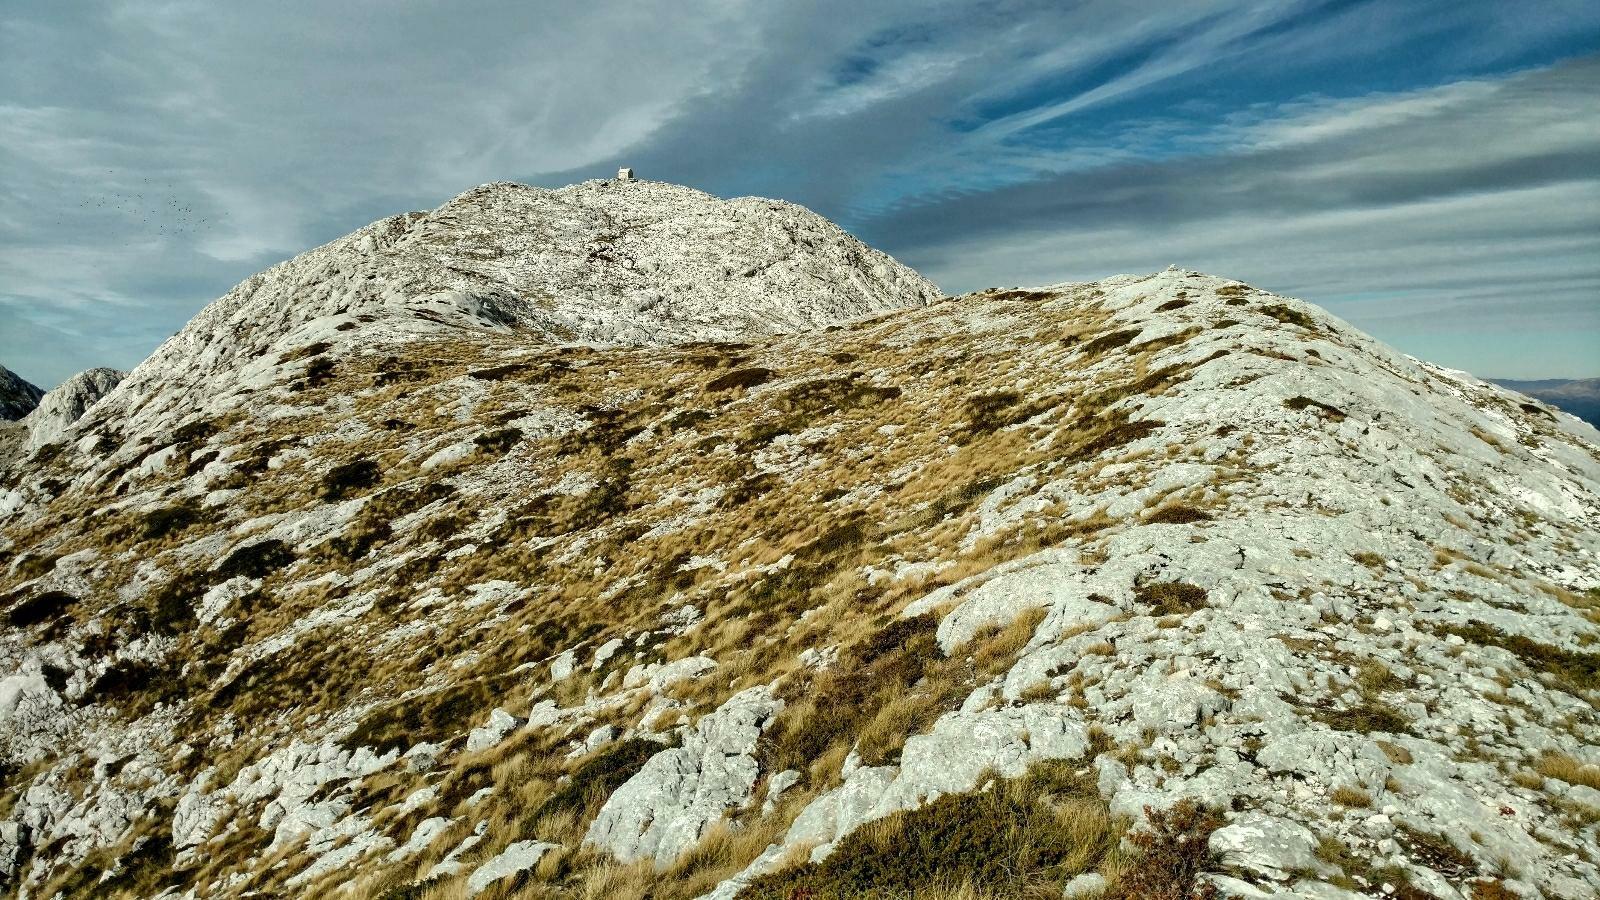 Stage 18: Biokovo Nature Park, my new favourite mountain 😍